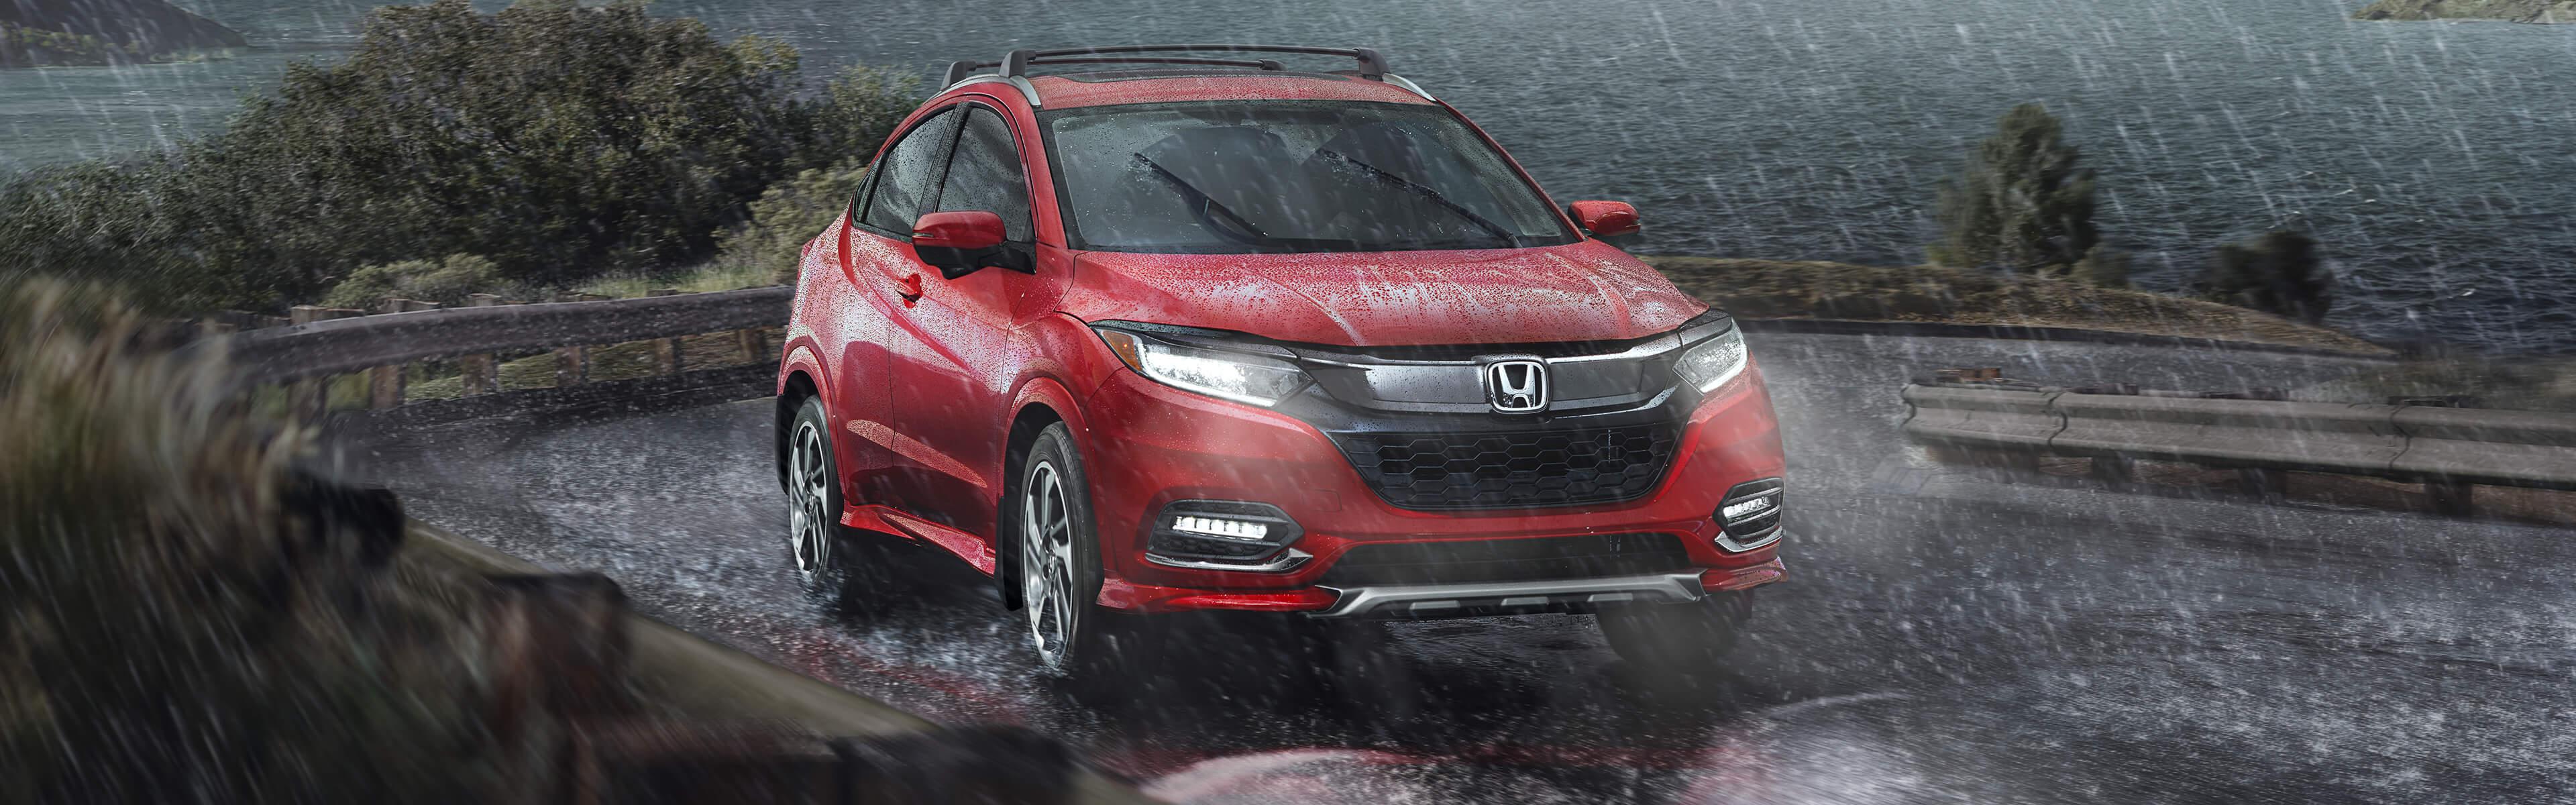 Secure A Sporty 2019 Honda HR-V Crossover In New Glasgow, Nova Scotia